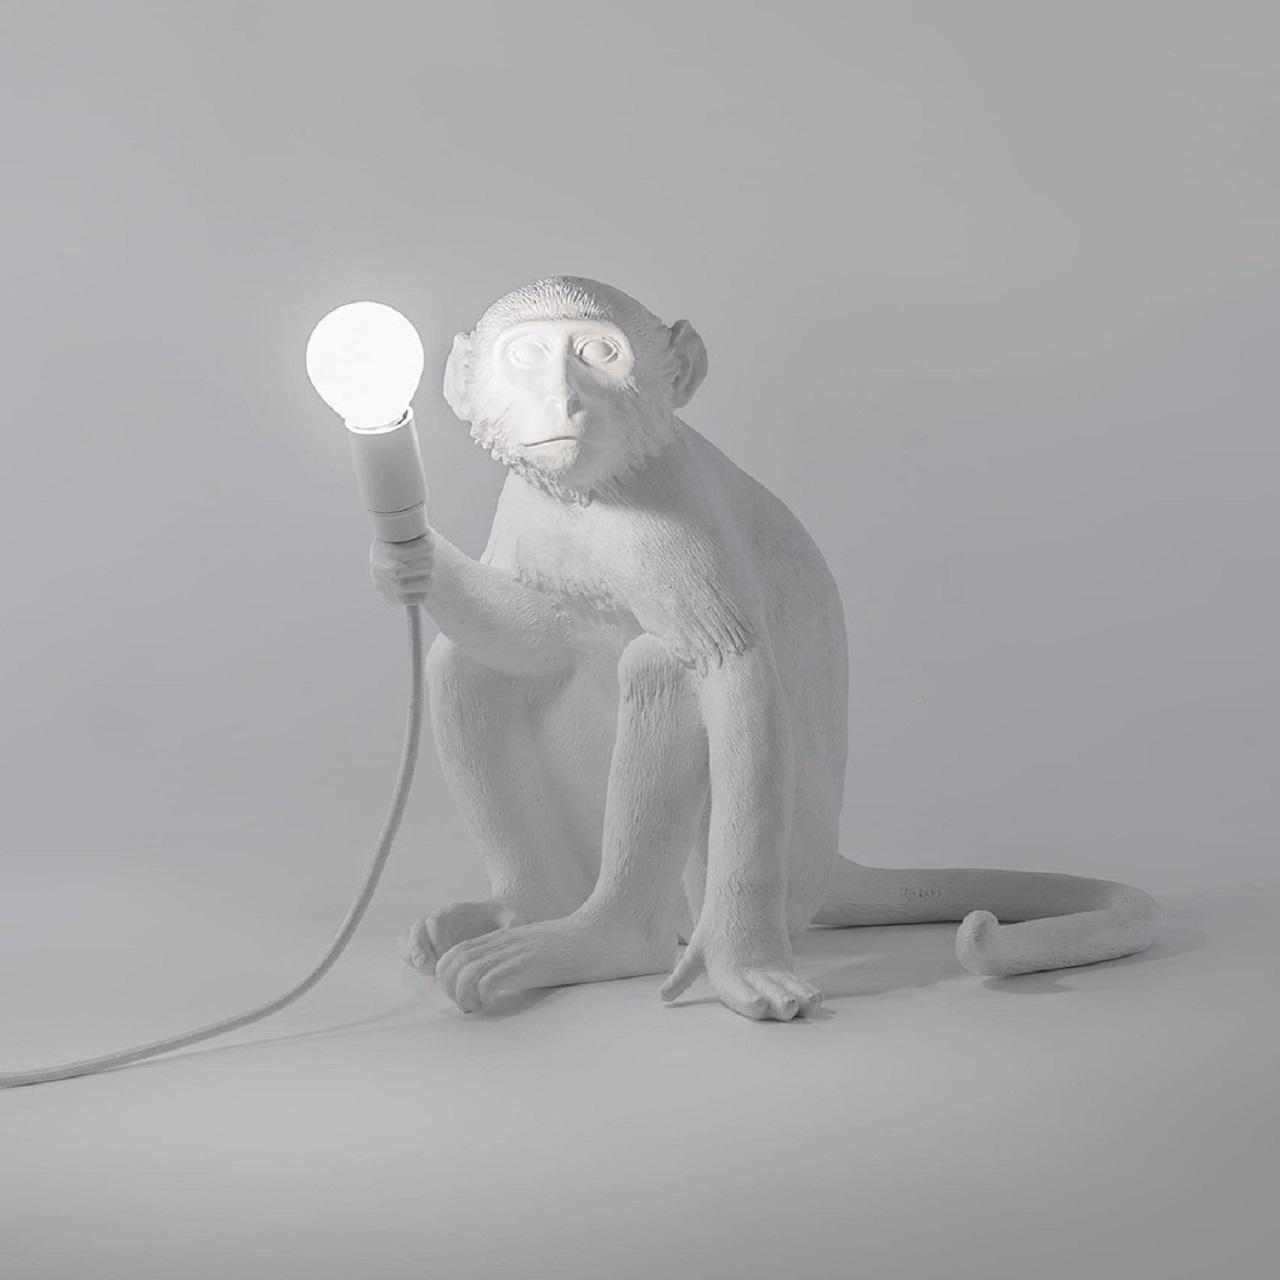 Monkey Lamp sentado | Branco